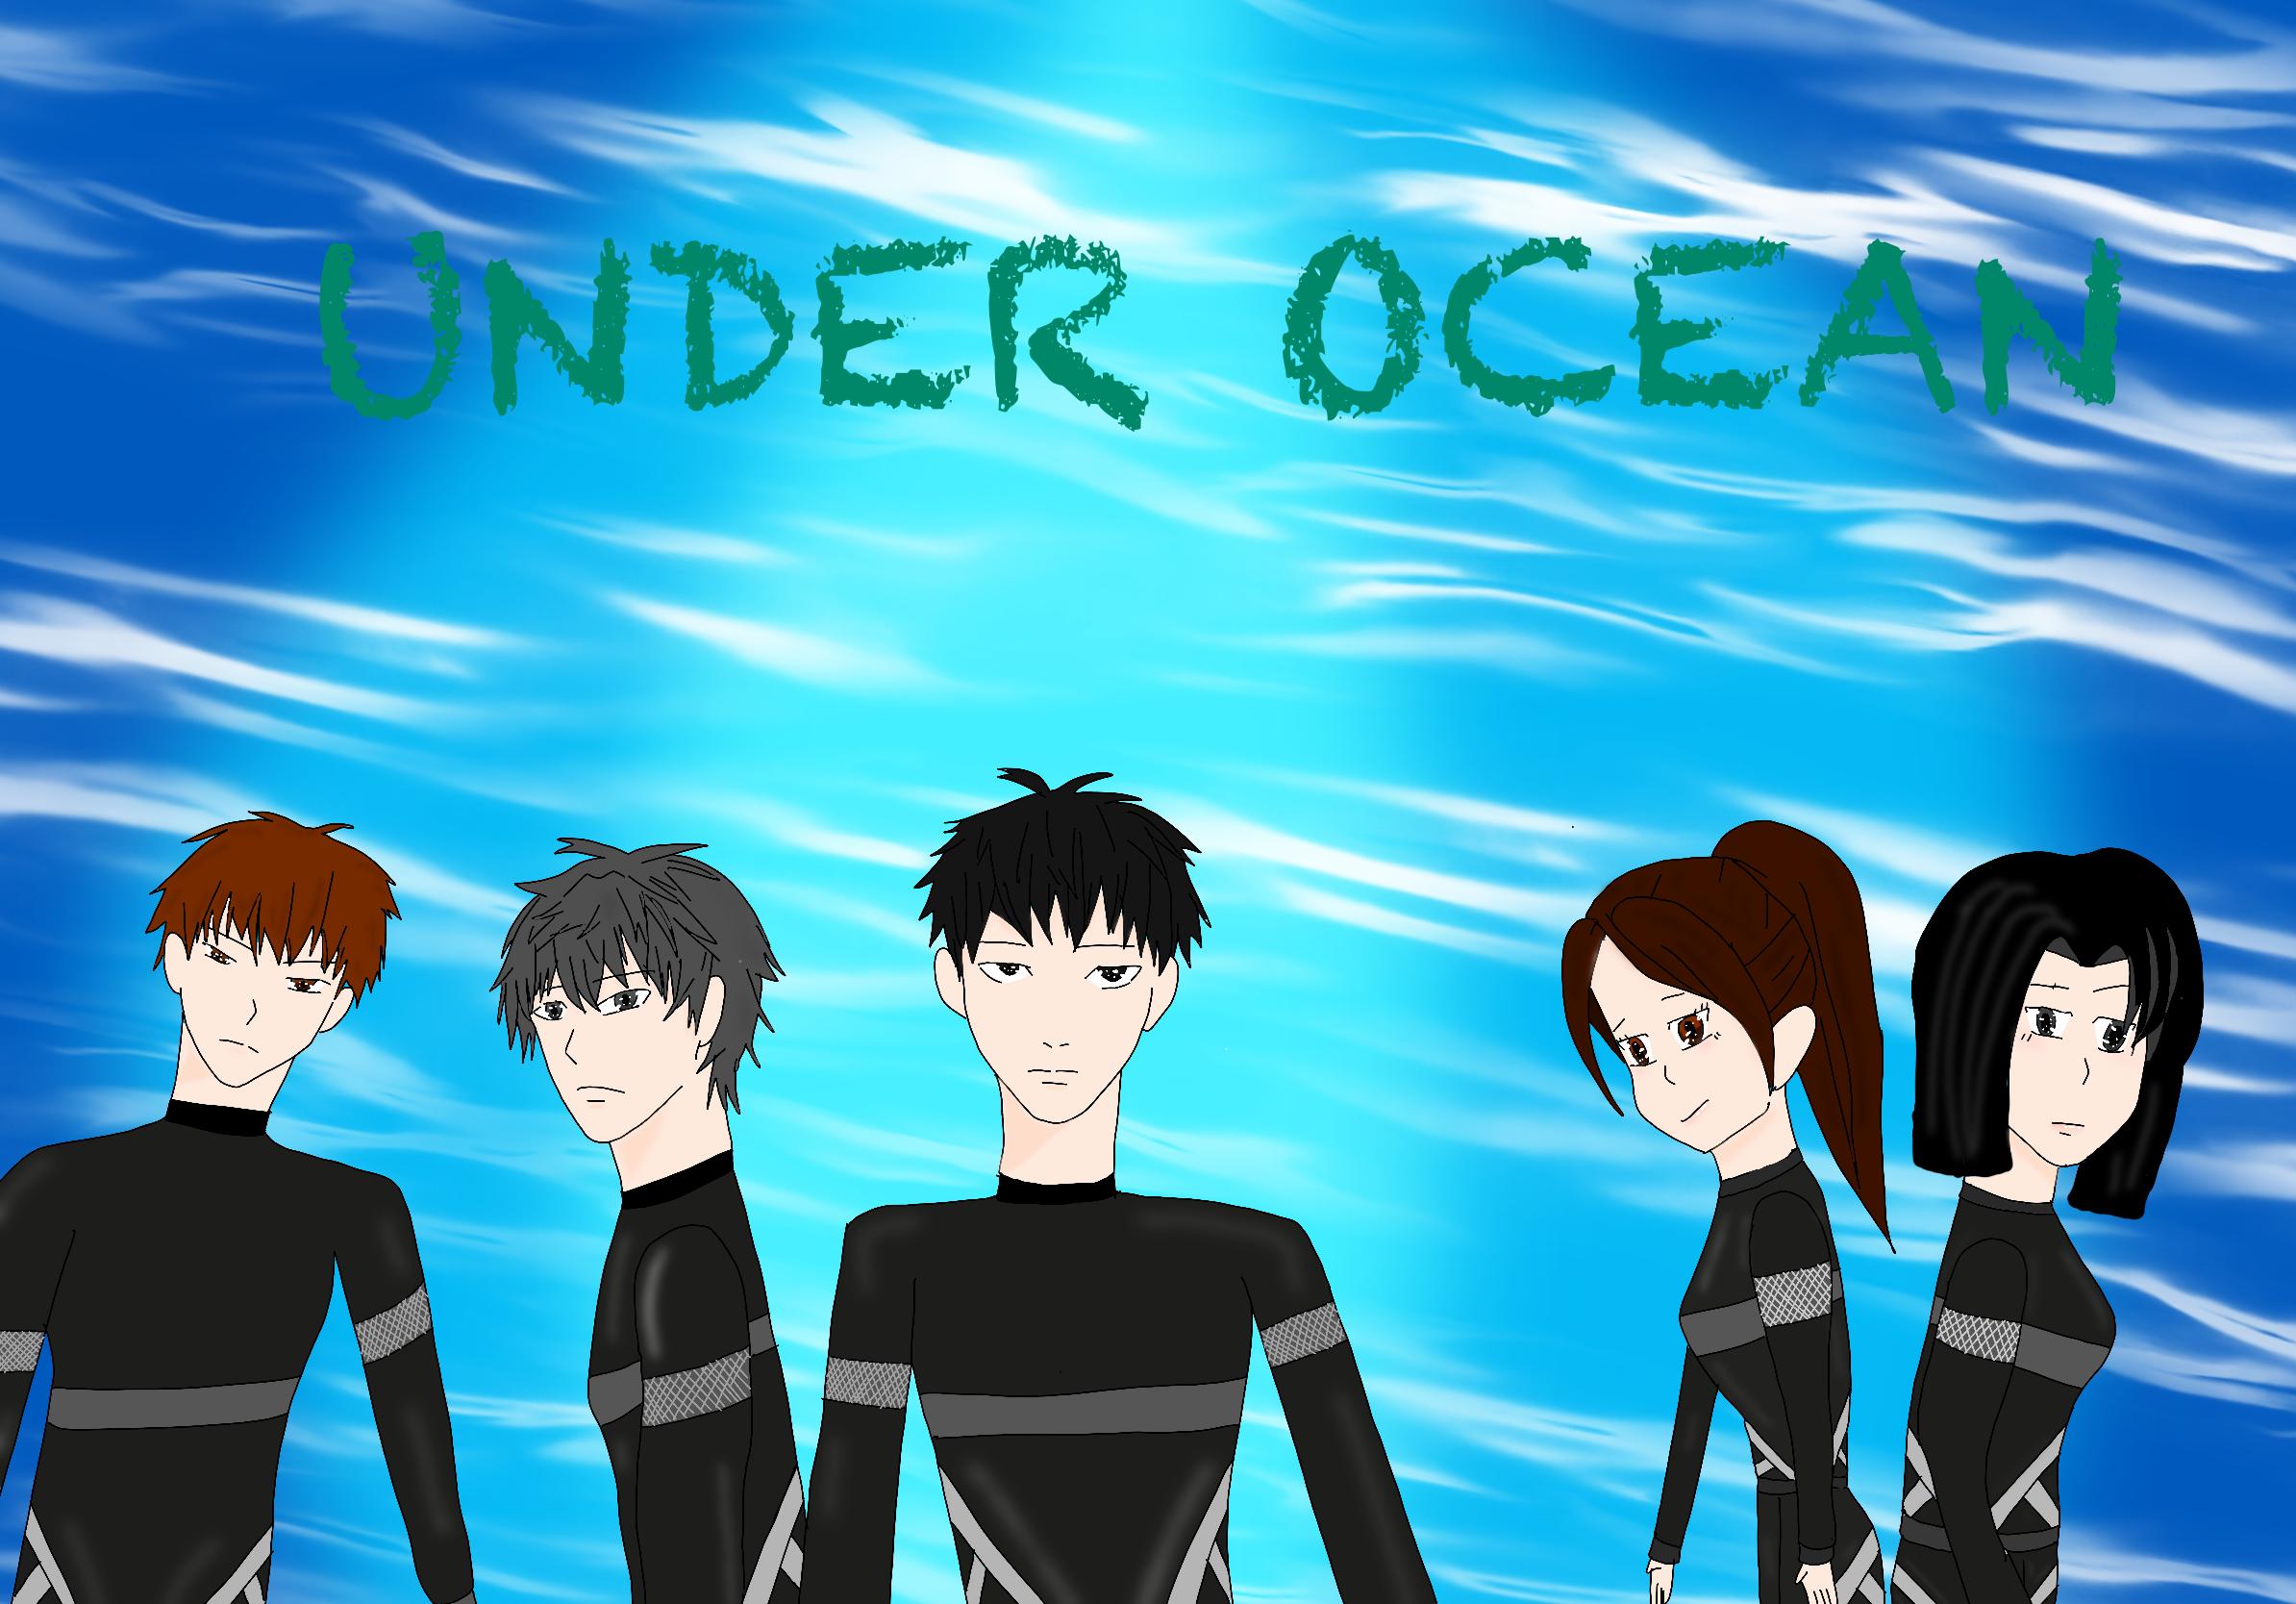 Under Ocean ทะเลลึกมากความลับ